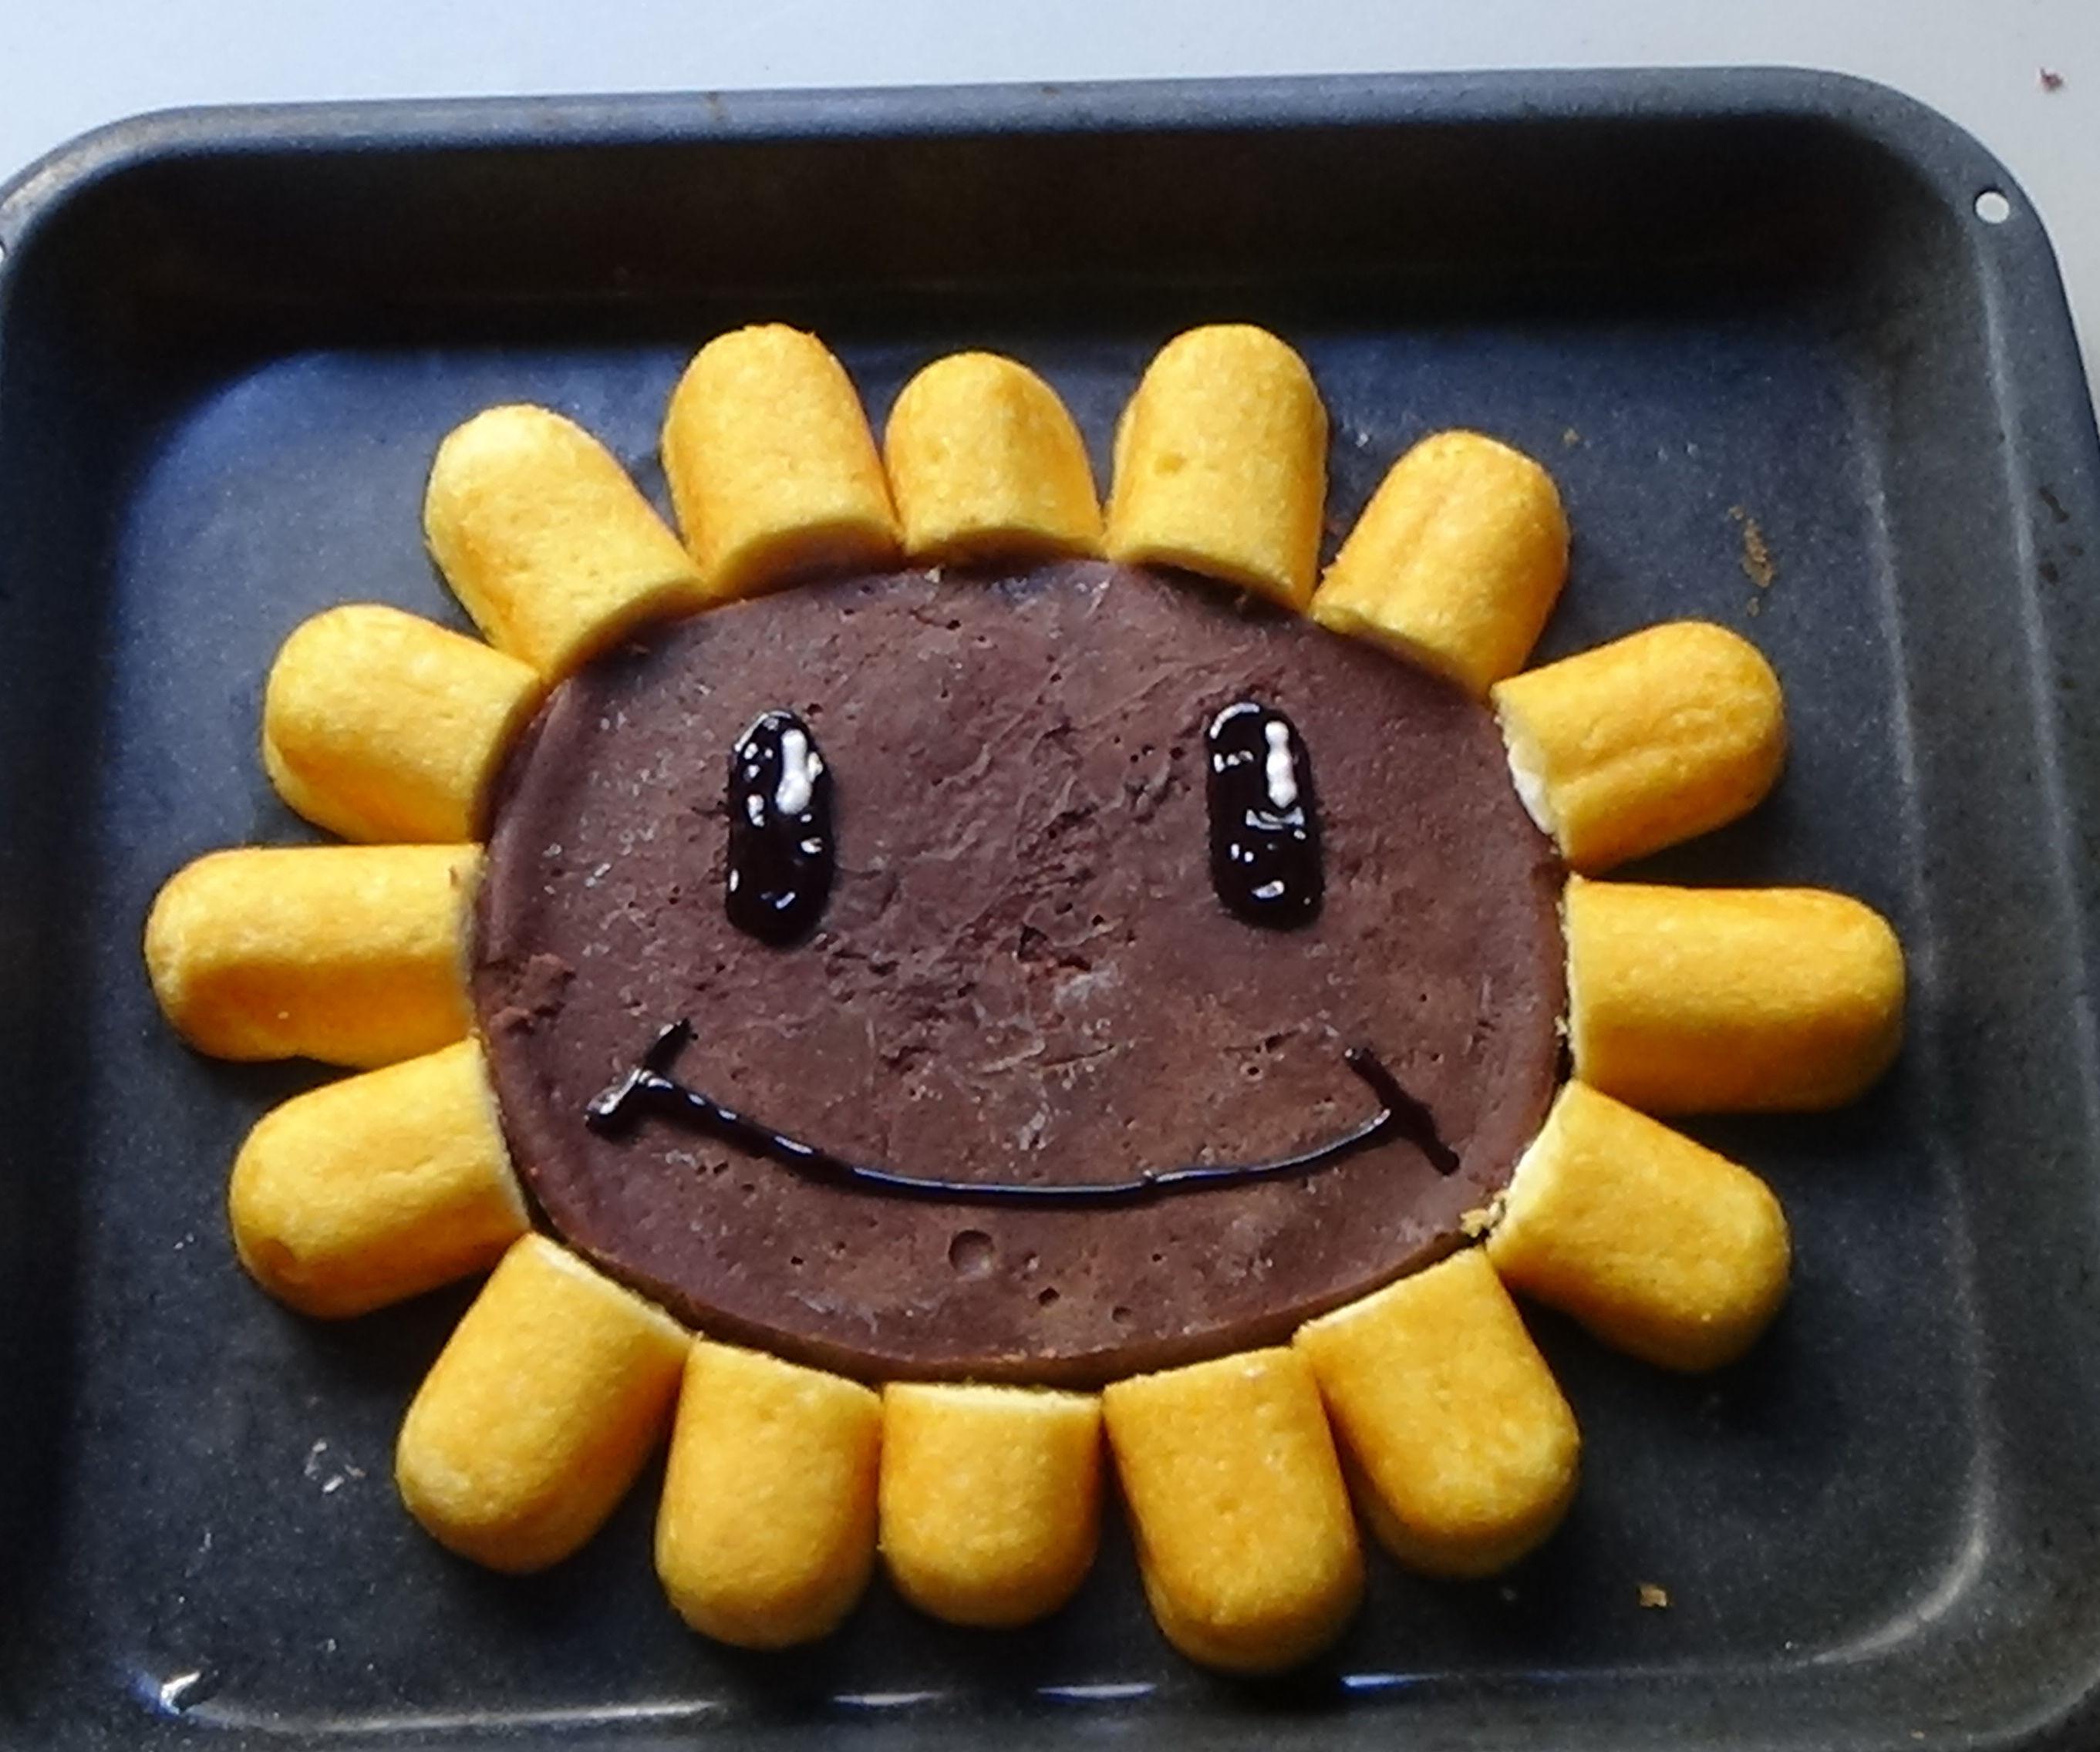 Plants vs Zombies Sunflower Cake